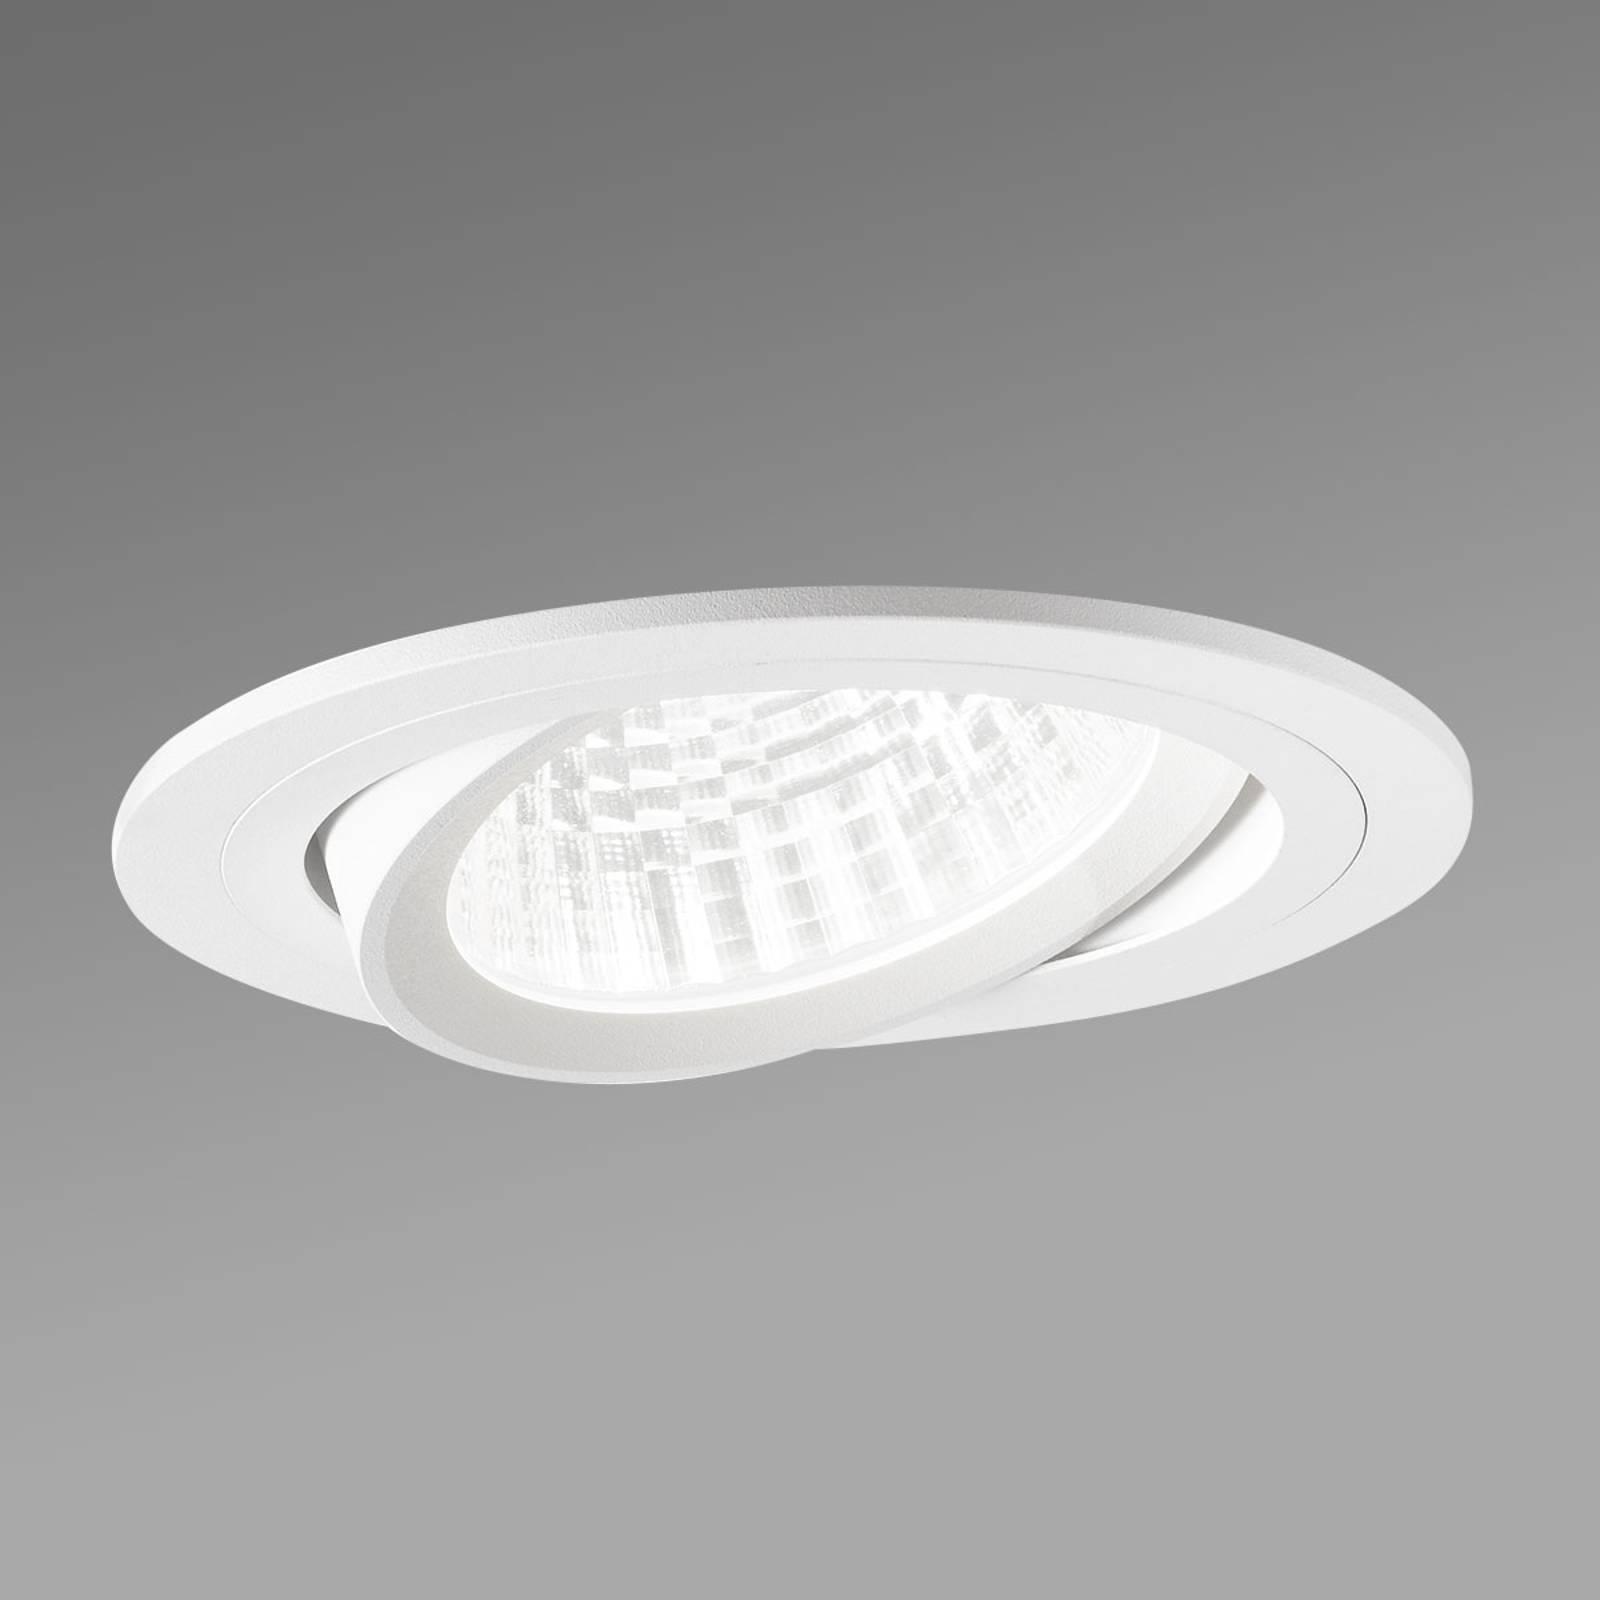 LED-Einbaustrahler Varo, 2 x 20° schwenkbar